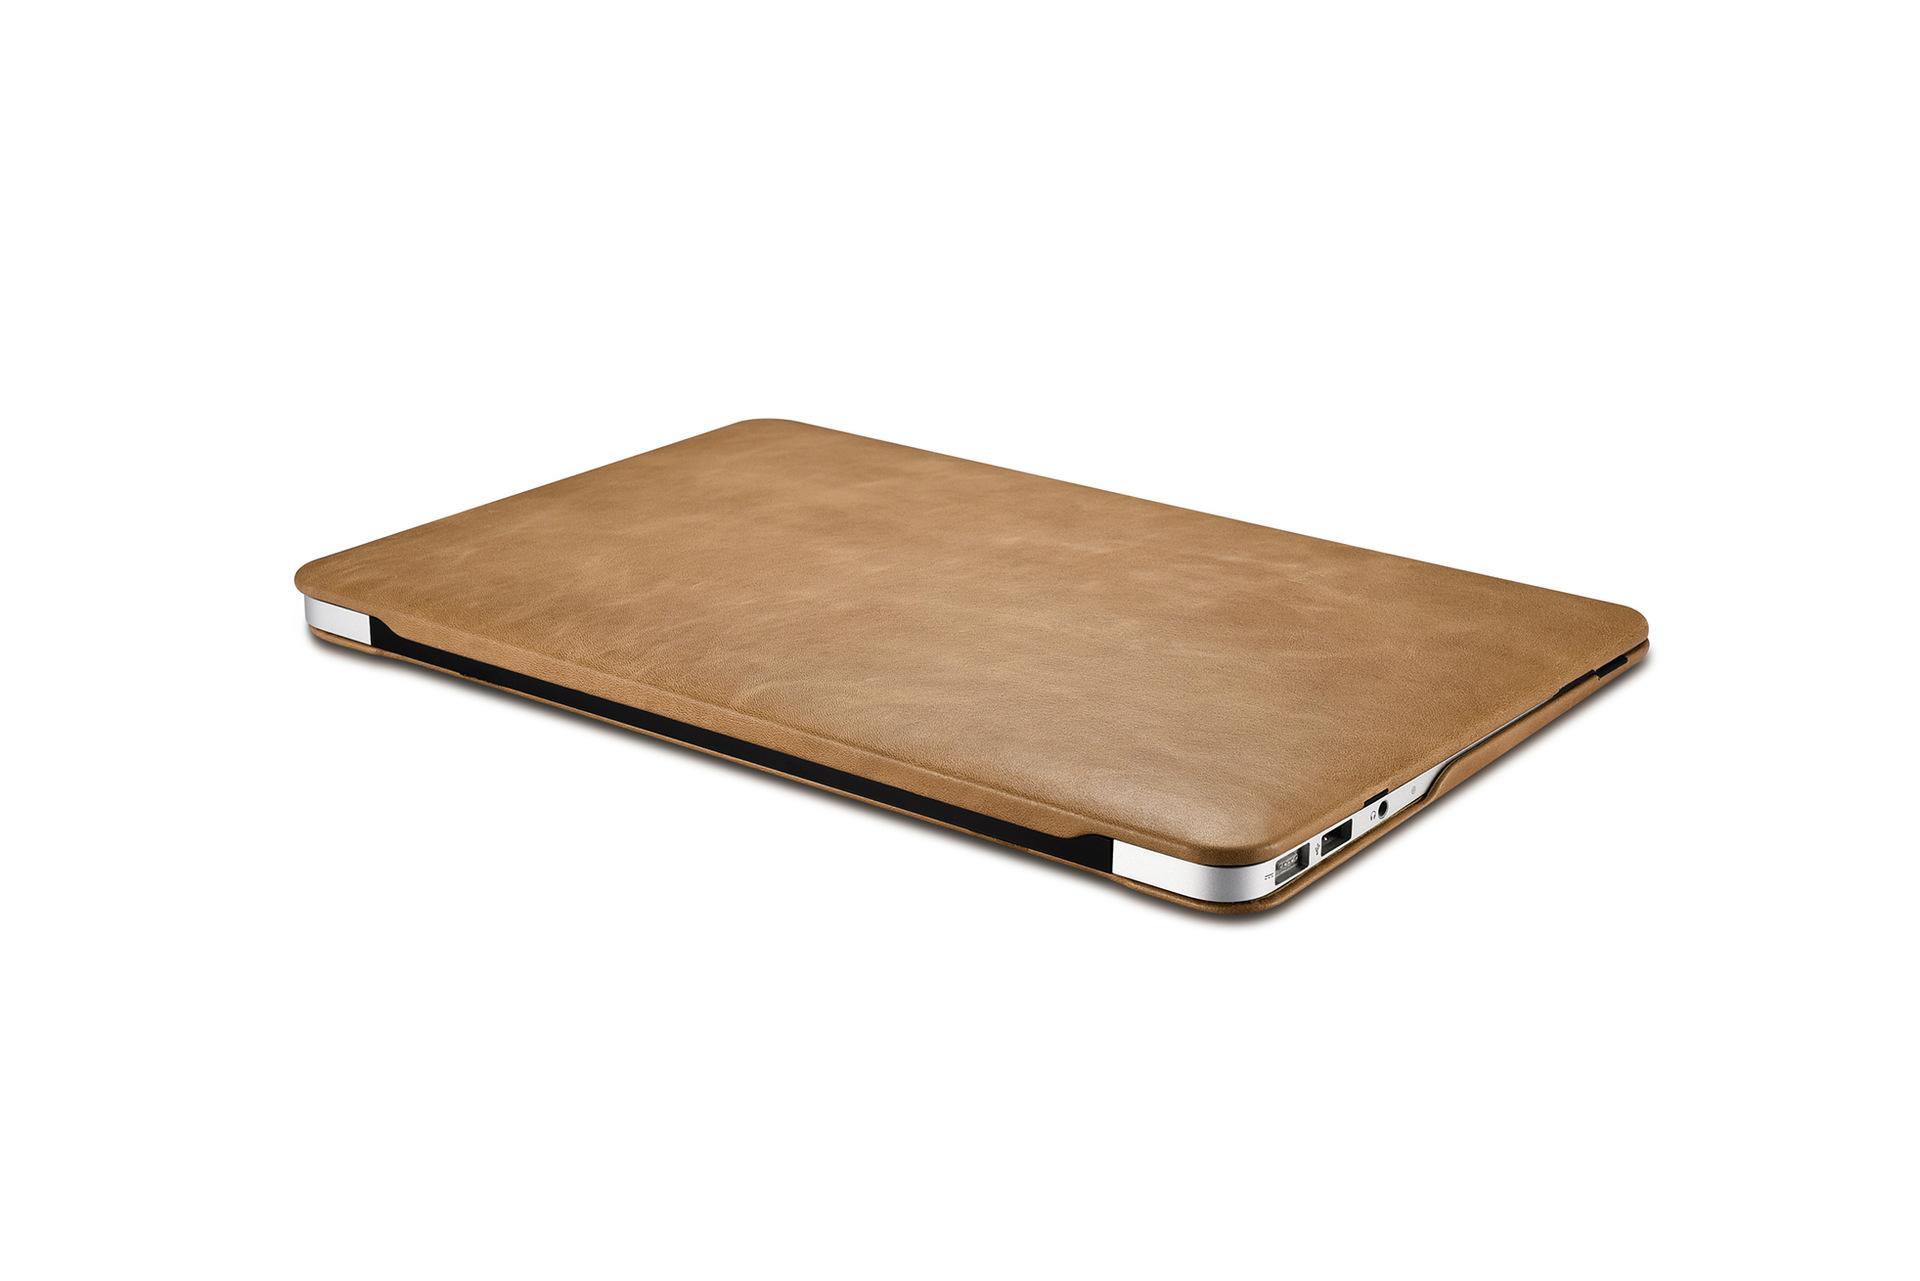 iCarer MacBook Air 11 inch Vintage Book Style Slim Folio Case 9